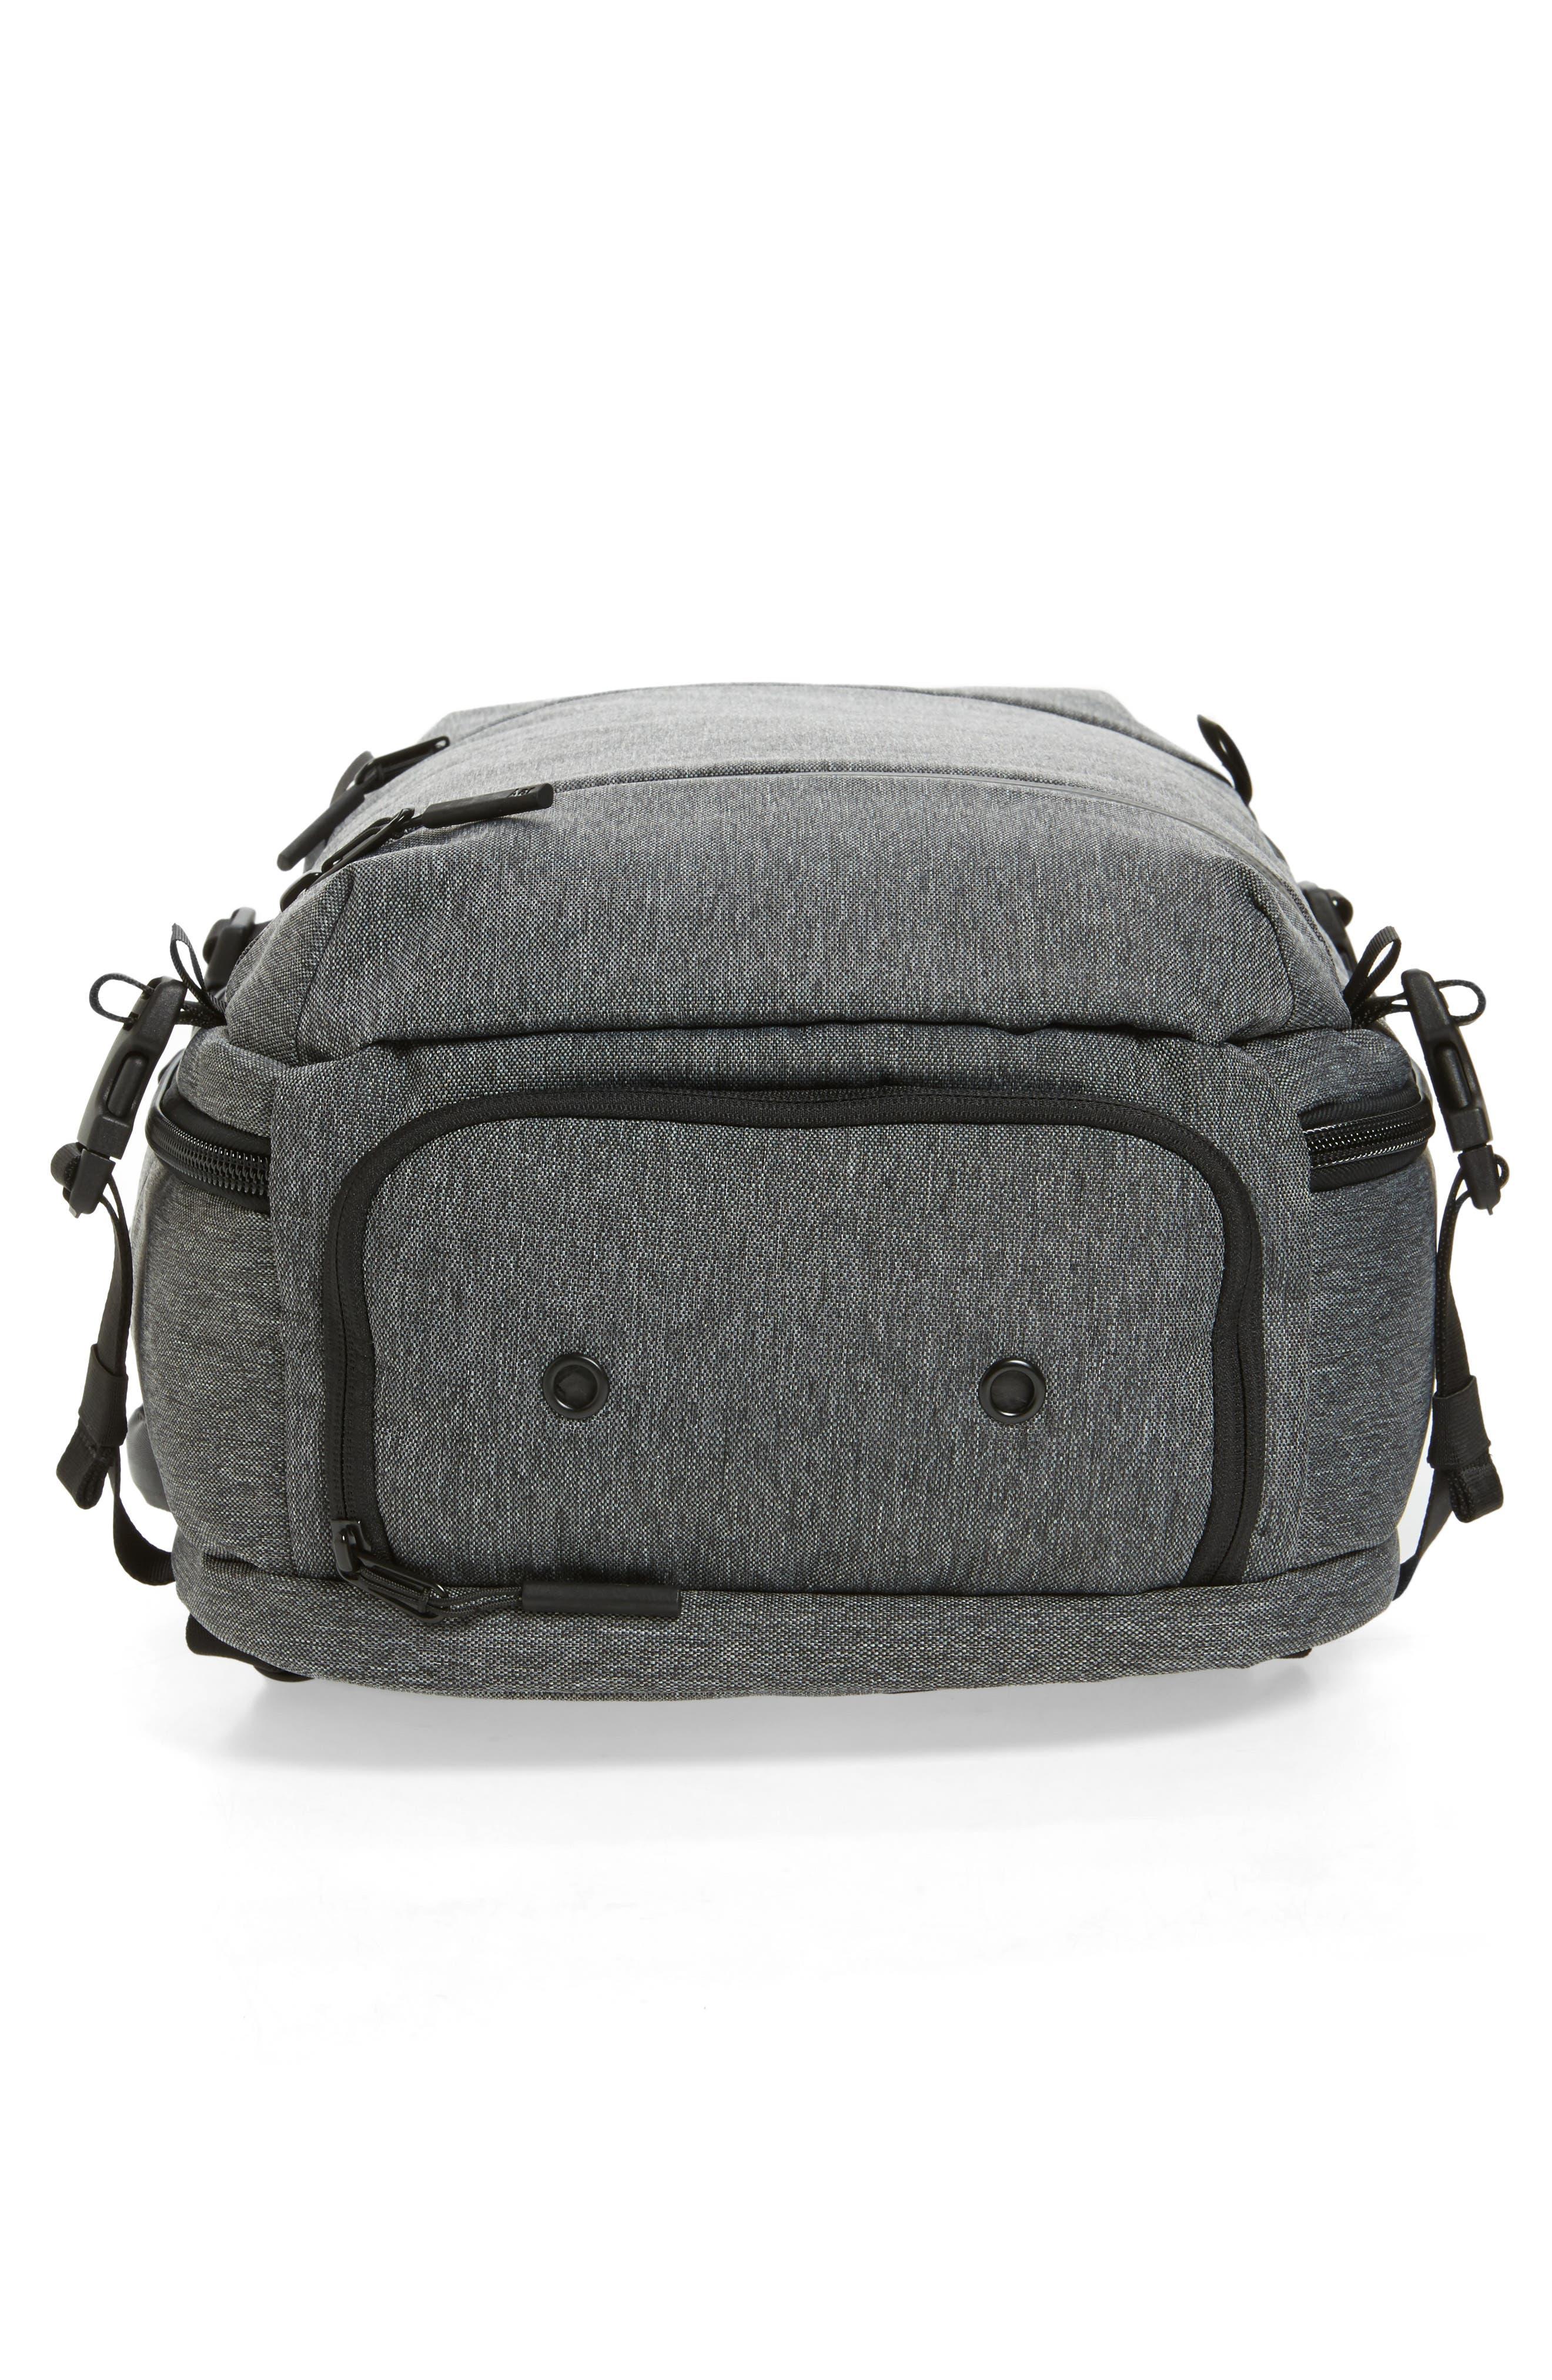 Travel Pack Backpack,                             Alternate thumbnail 6, color,                             Grey